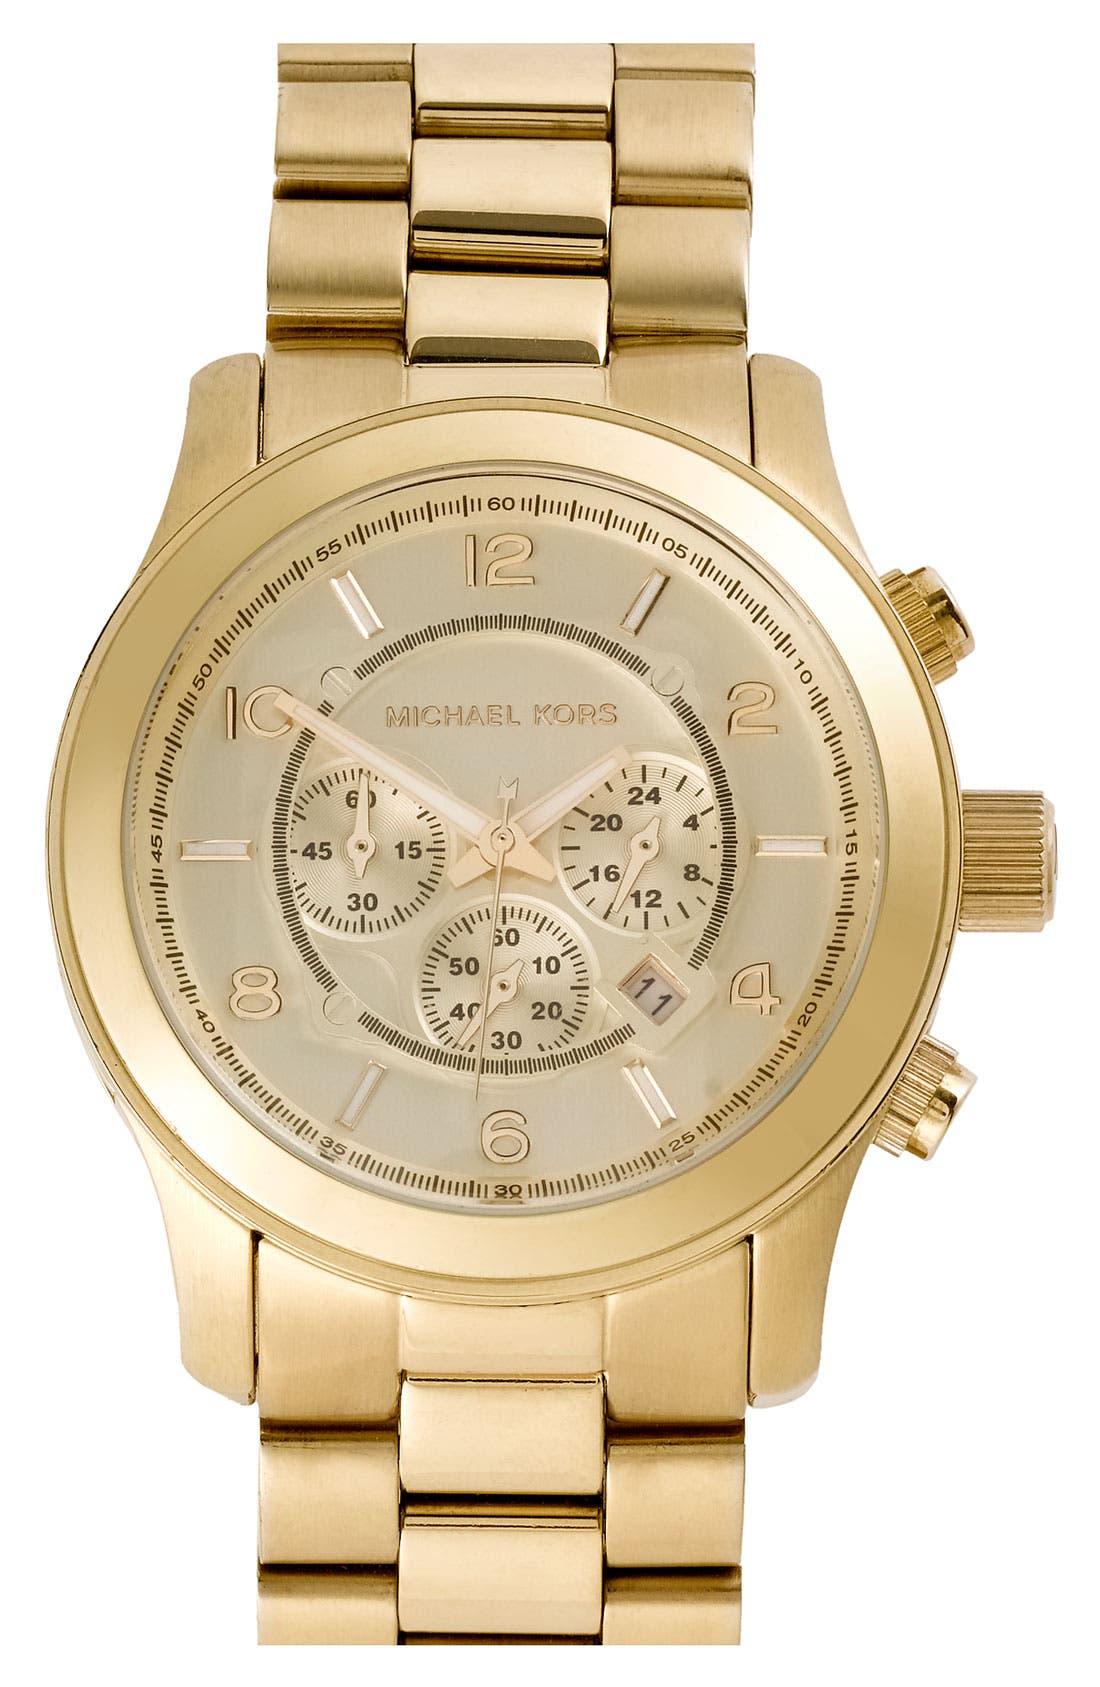 Michael Kors 'Large Runway' Chronograph Bracelet Watch, 45mm